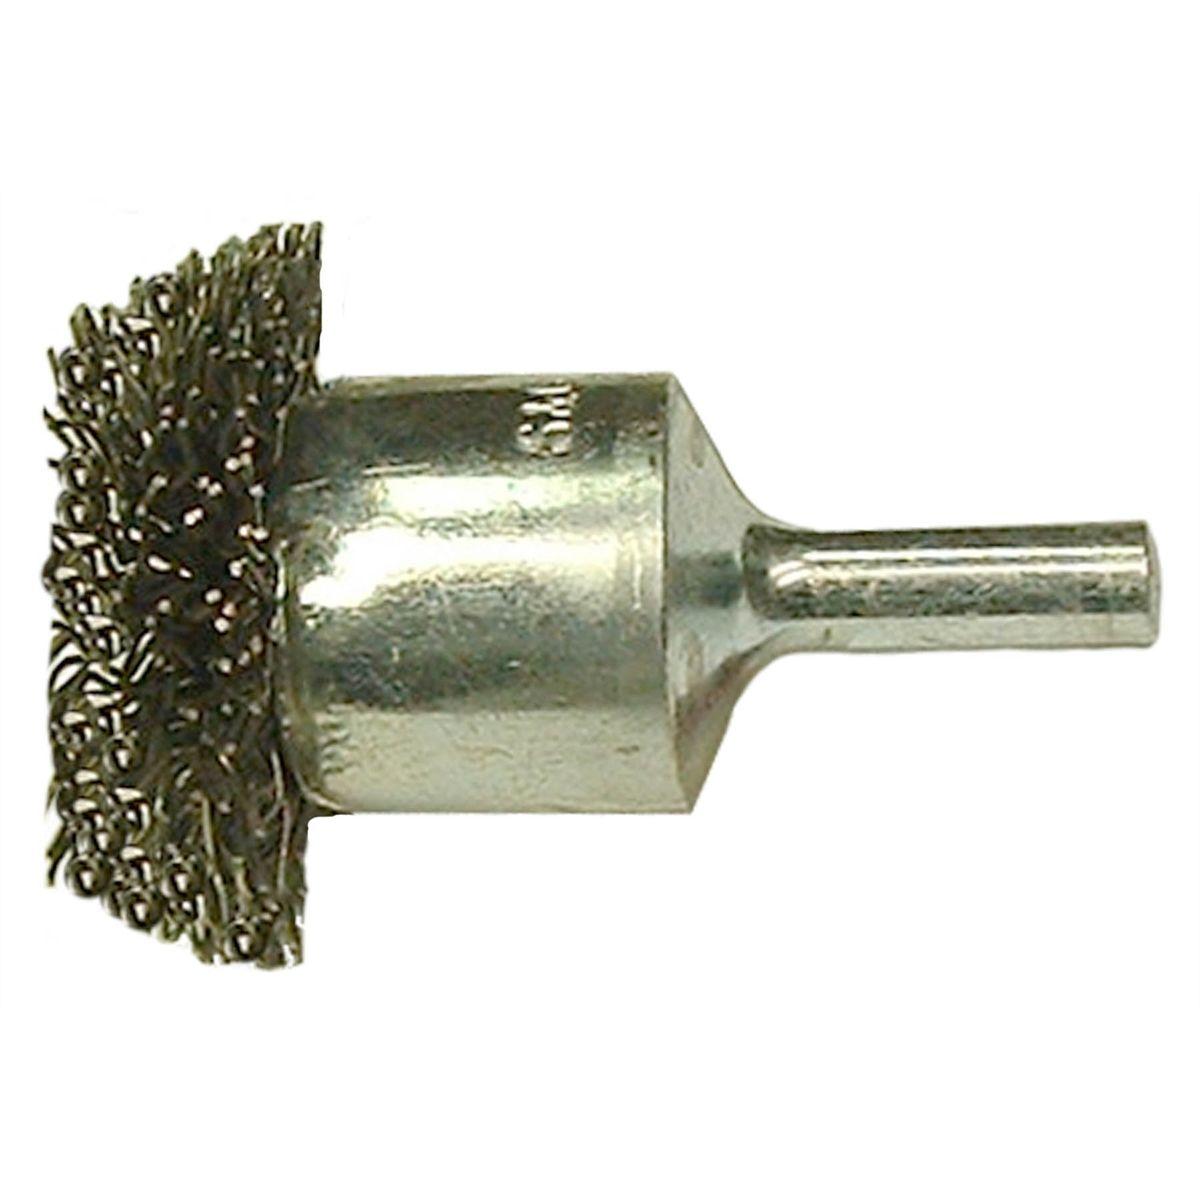 S /& G Tool-Aid 17100 End Brush Circular Flared